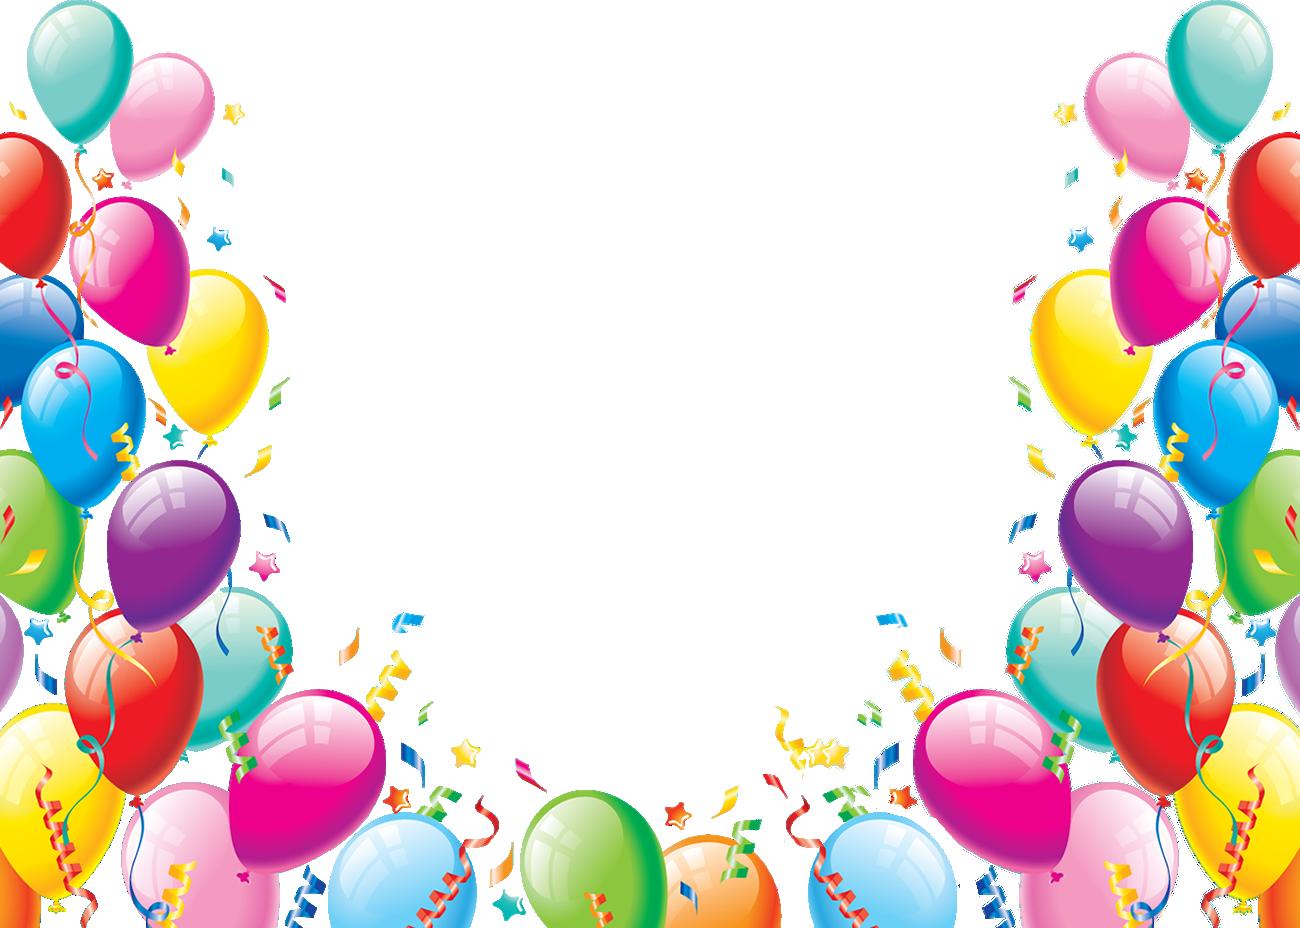 Topp party hire supplies. Clipart balloon gate